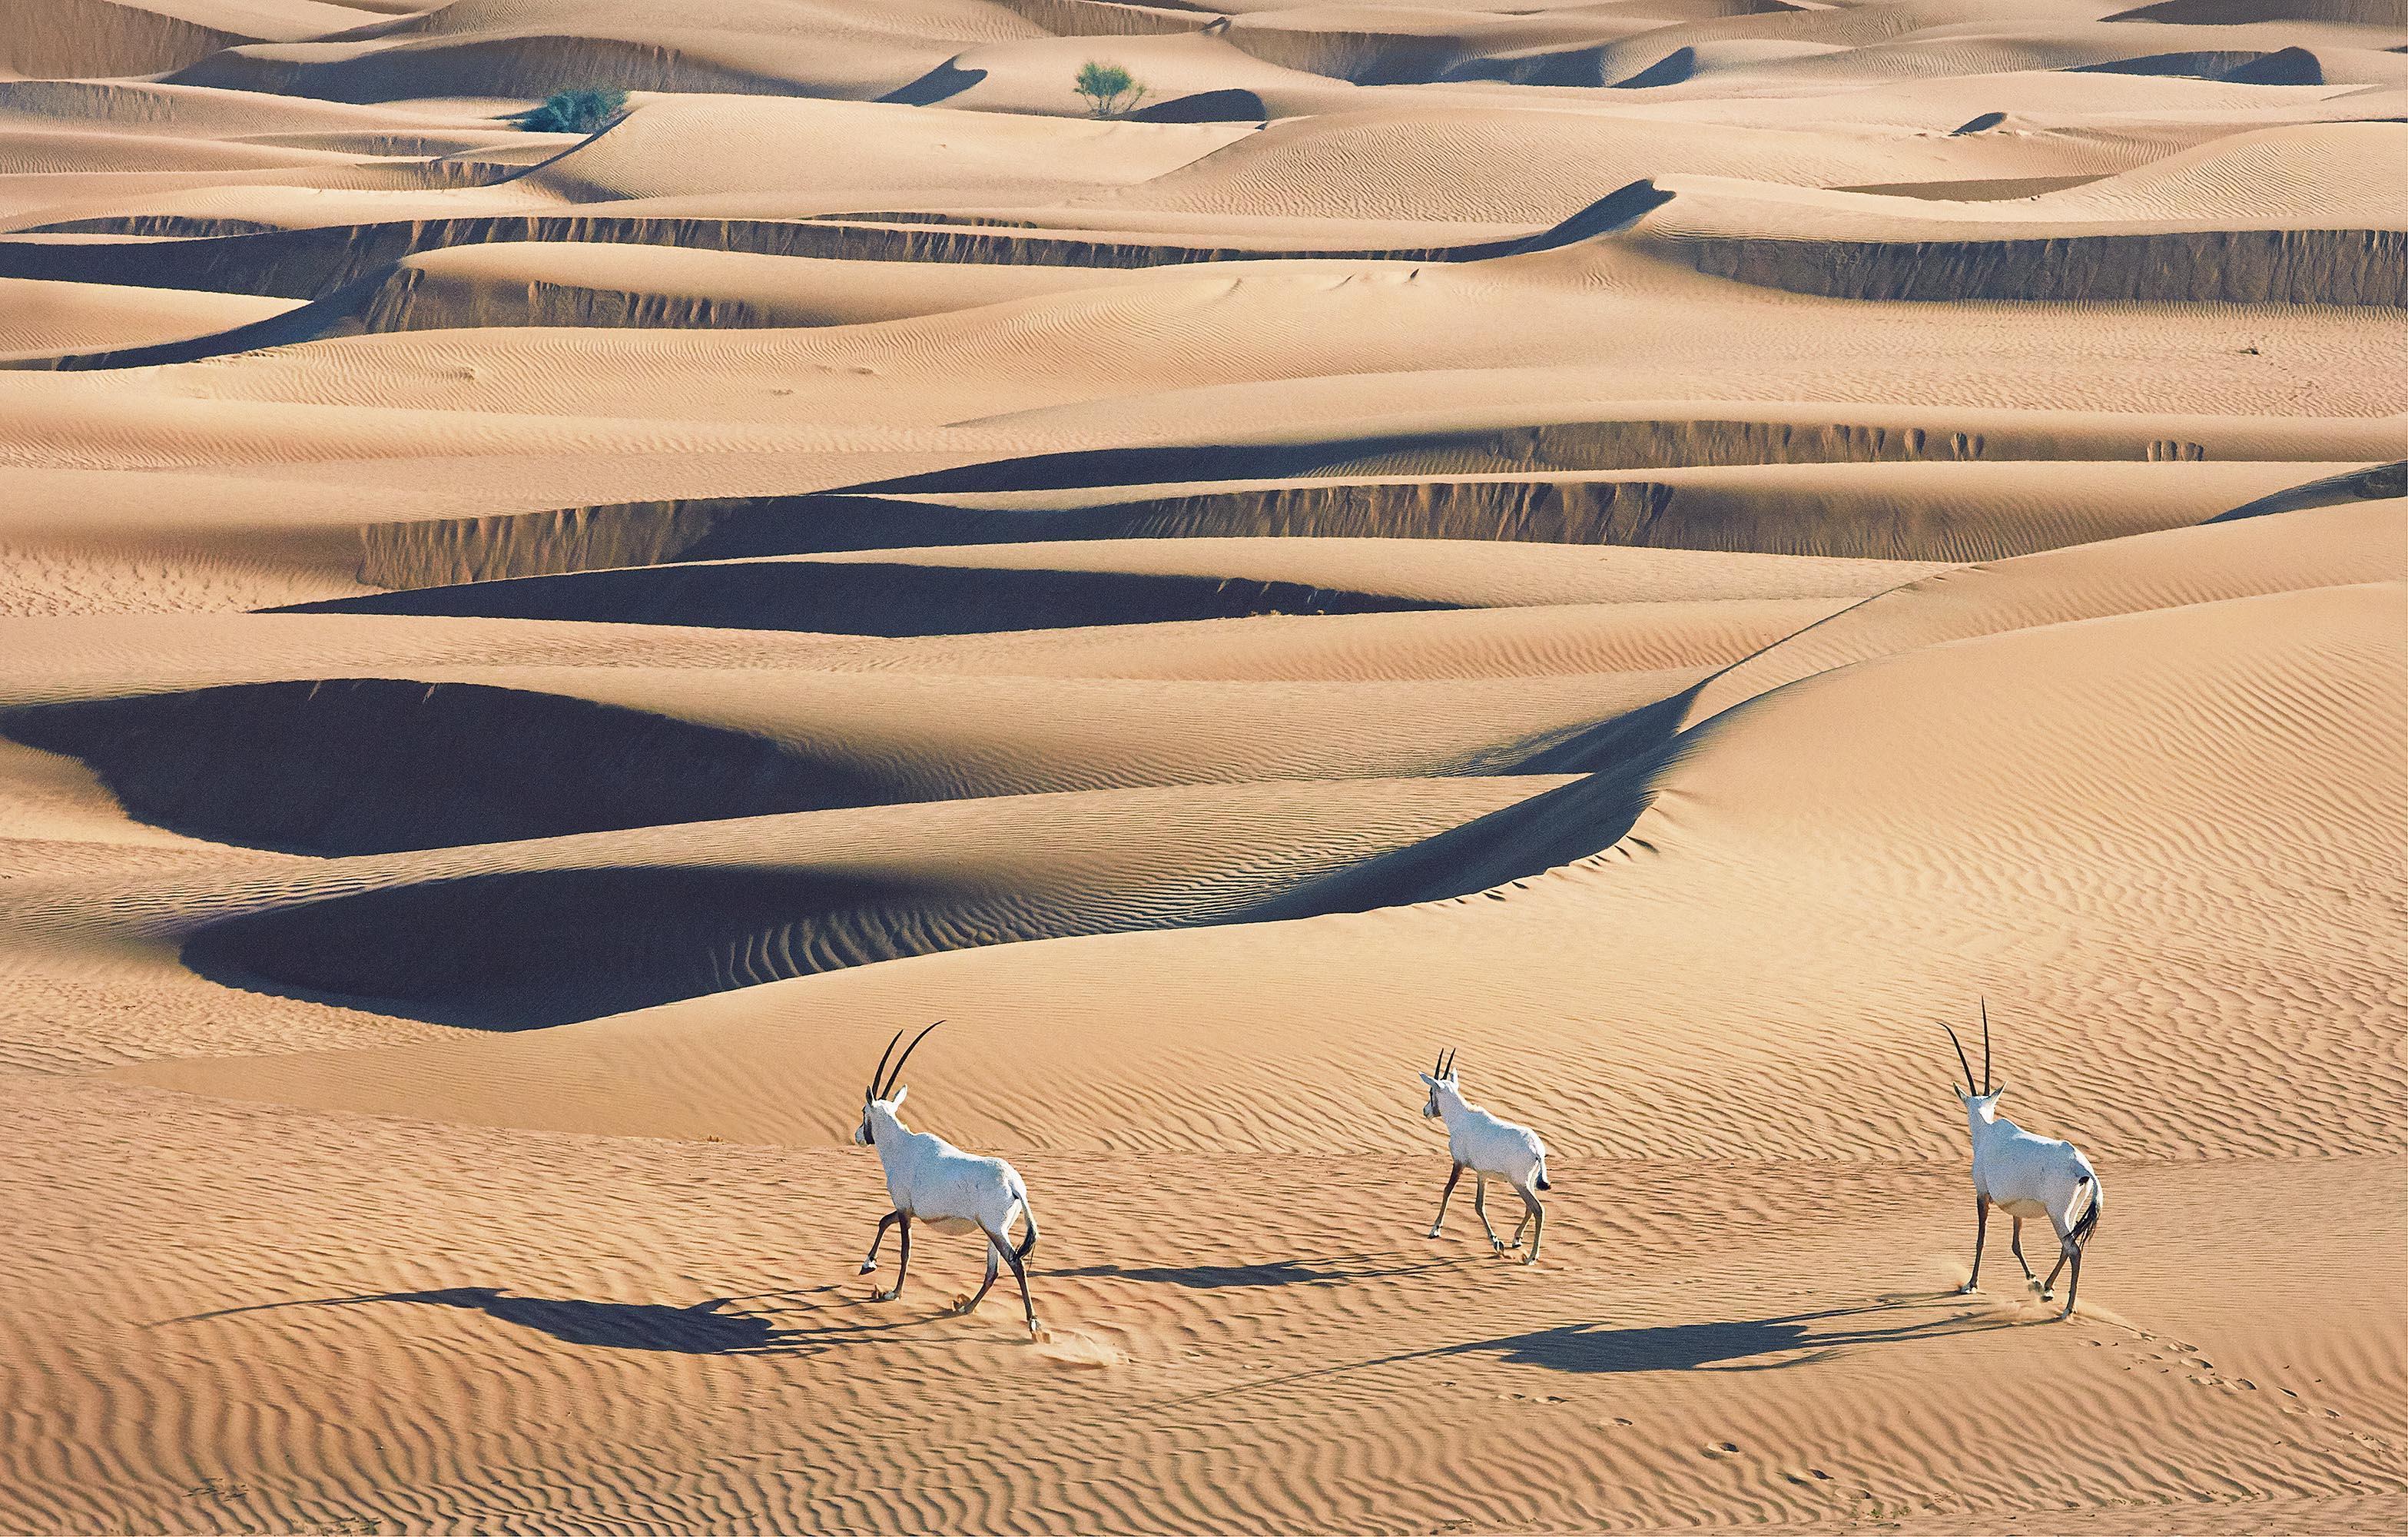 Tim_Flach_Arabian Oryx's.jpg